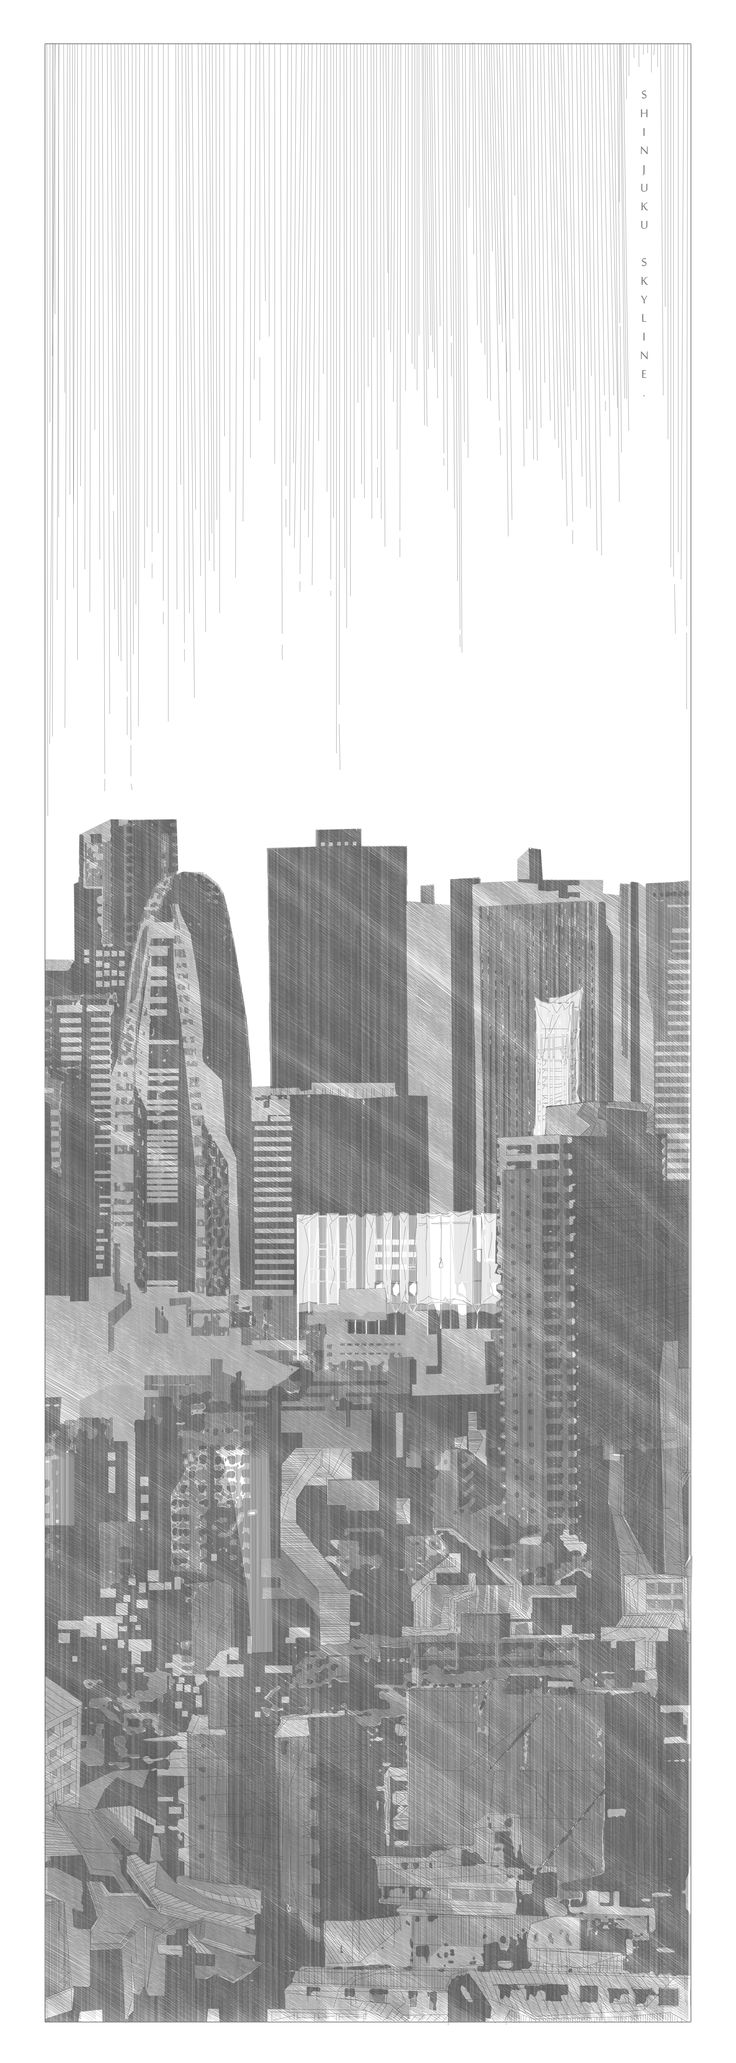 Shinjuku Skyline by Hamish Angus McAndrew #Shinjuku #Tokyo #architecture